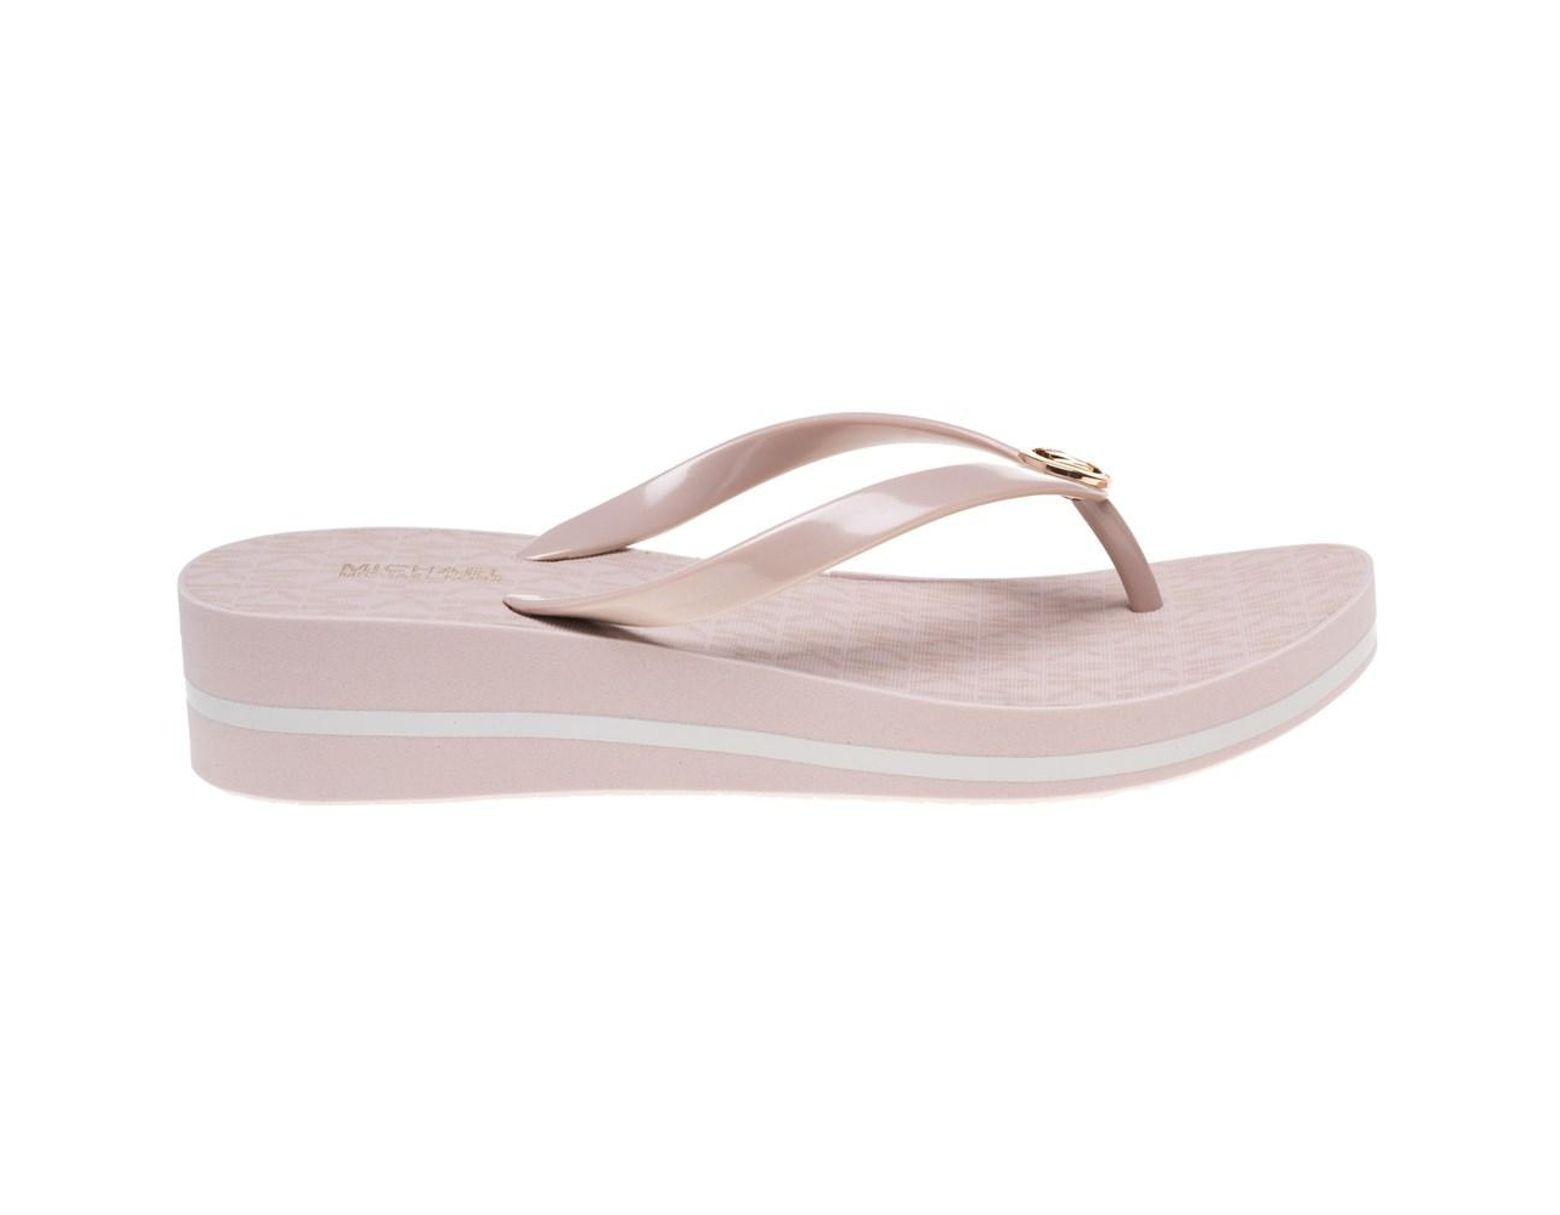 c6b1242ddf8 Michael Kors Bedford Flip Flop Stripe Sandals in Pink - Lyst